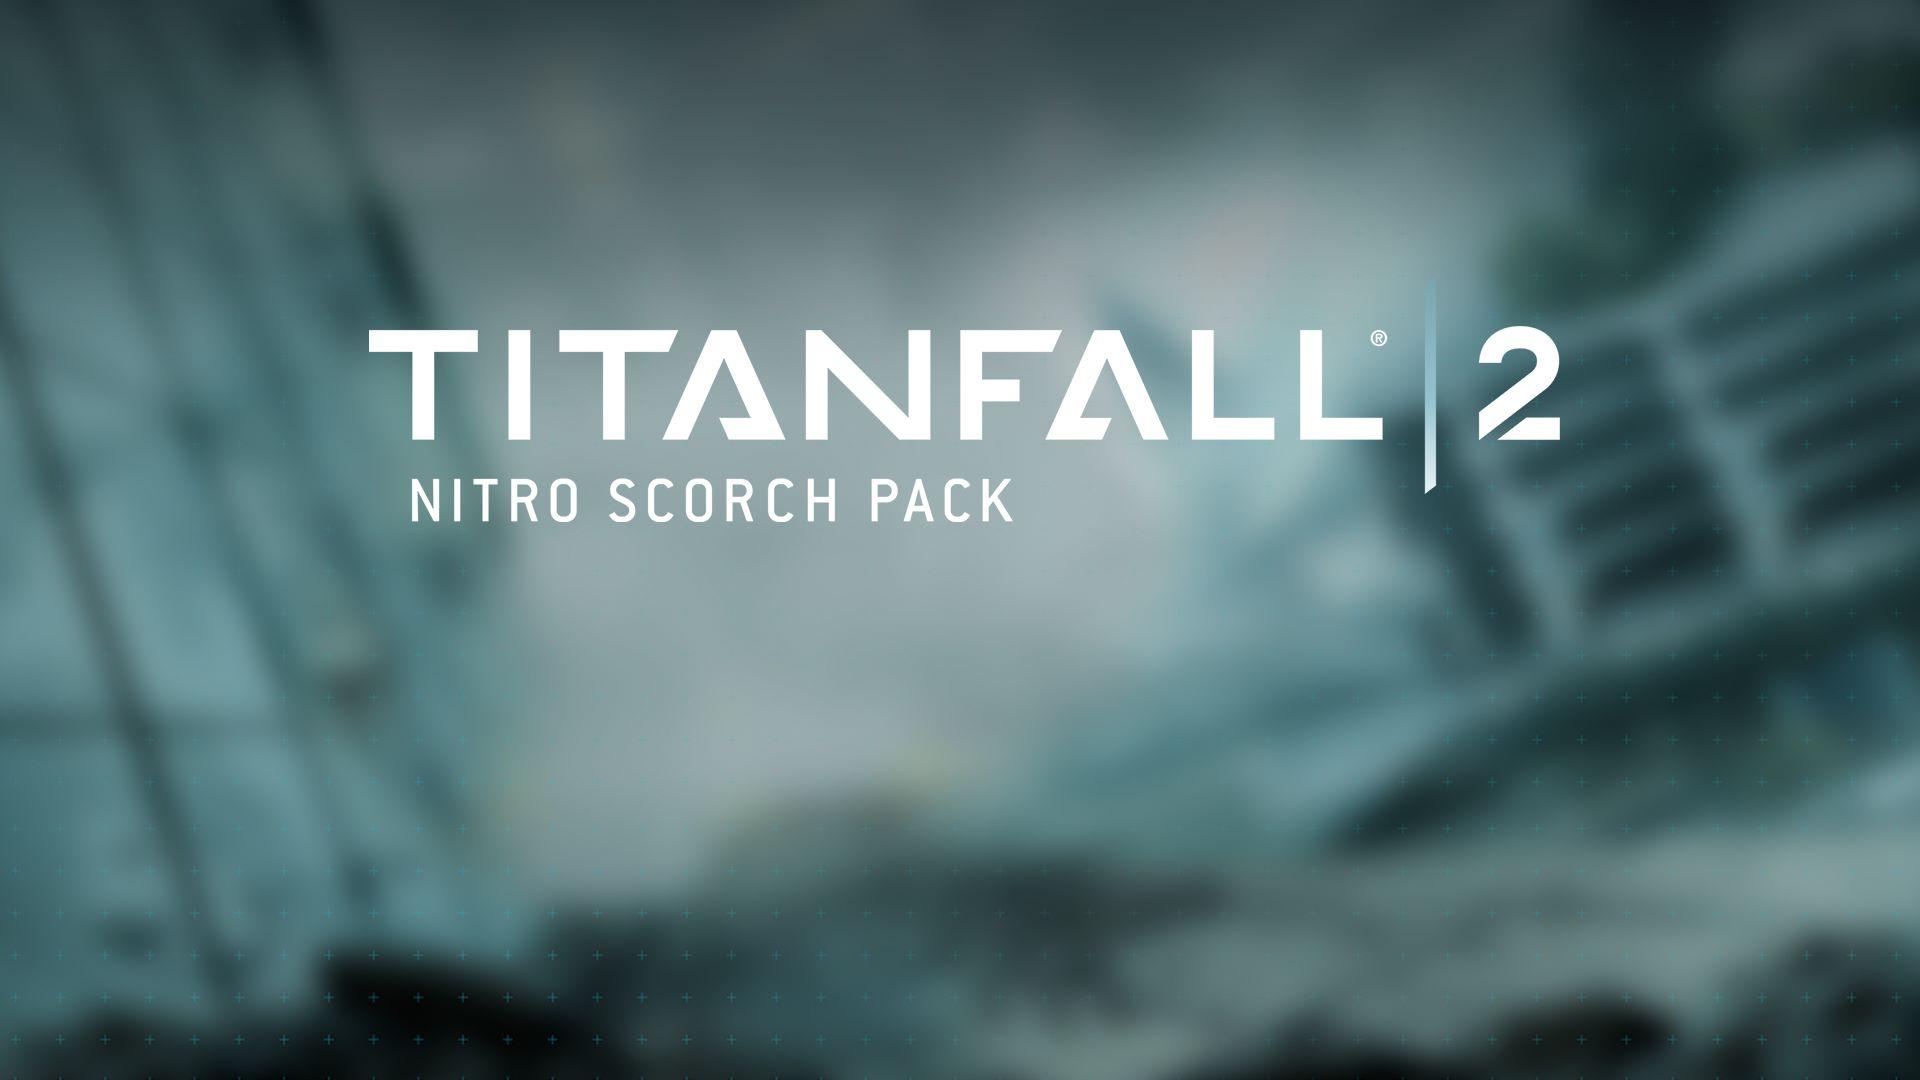 Titanfall™ 2 Nitro Scorch Pack